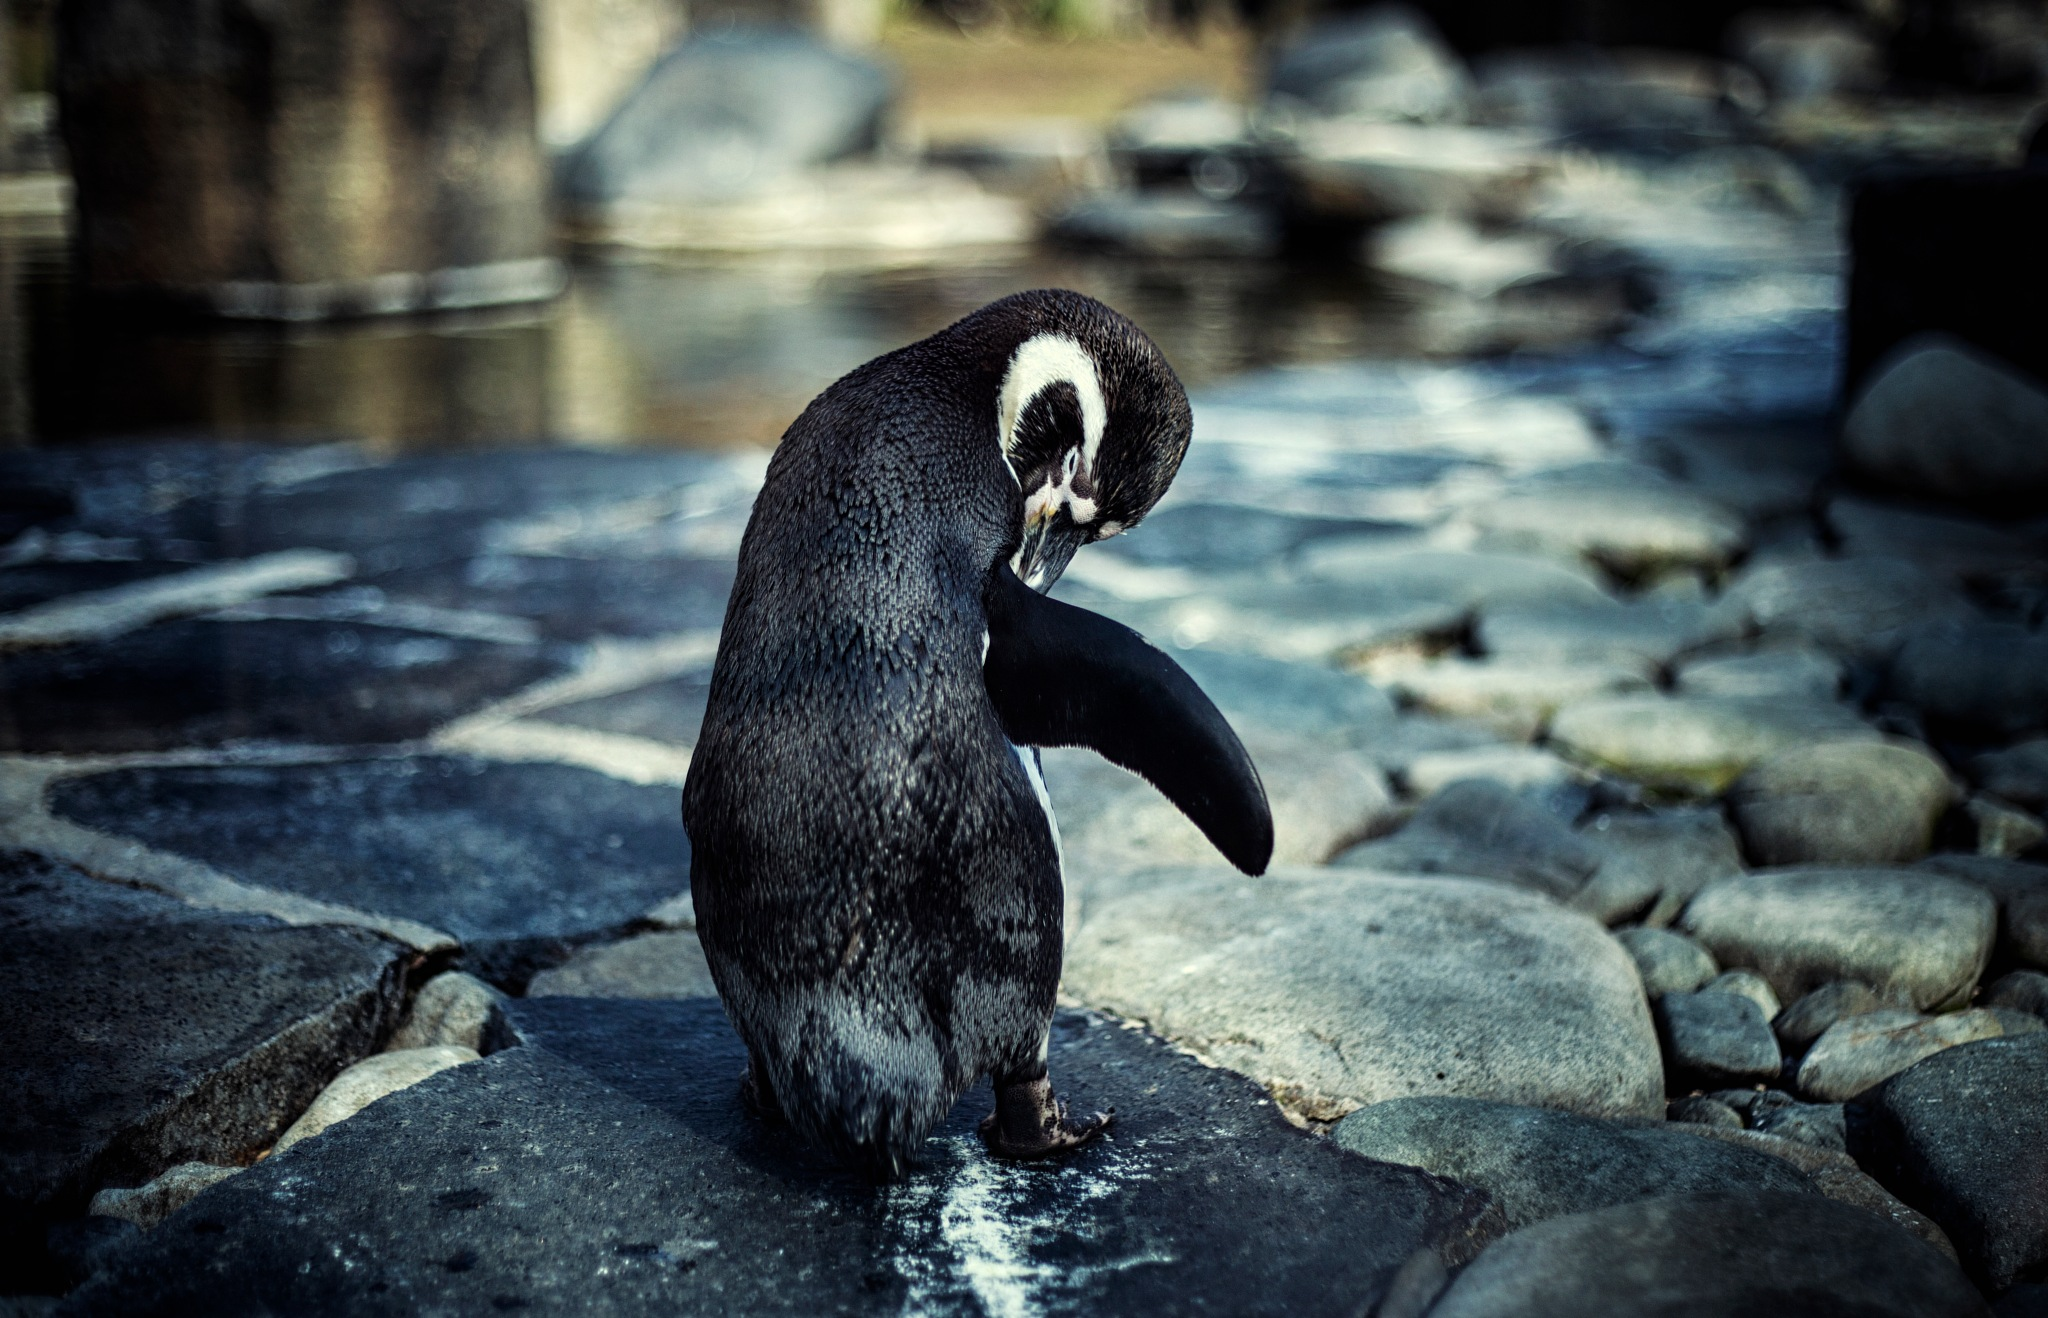 Prague Zoo Penguin by Neckyš Art & Photography